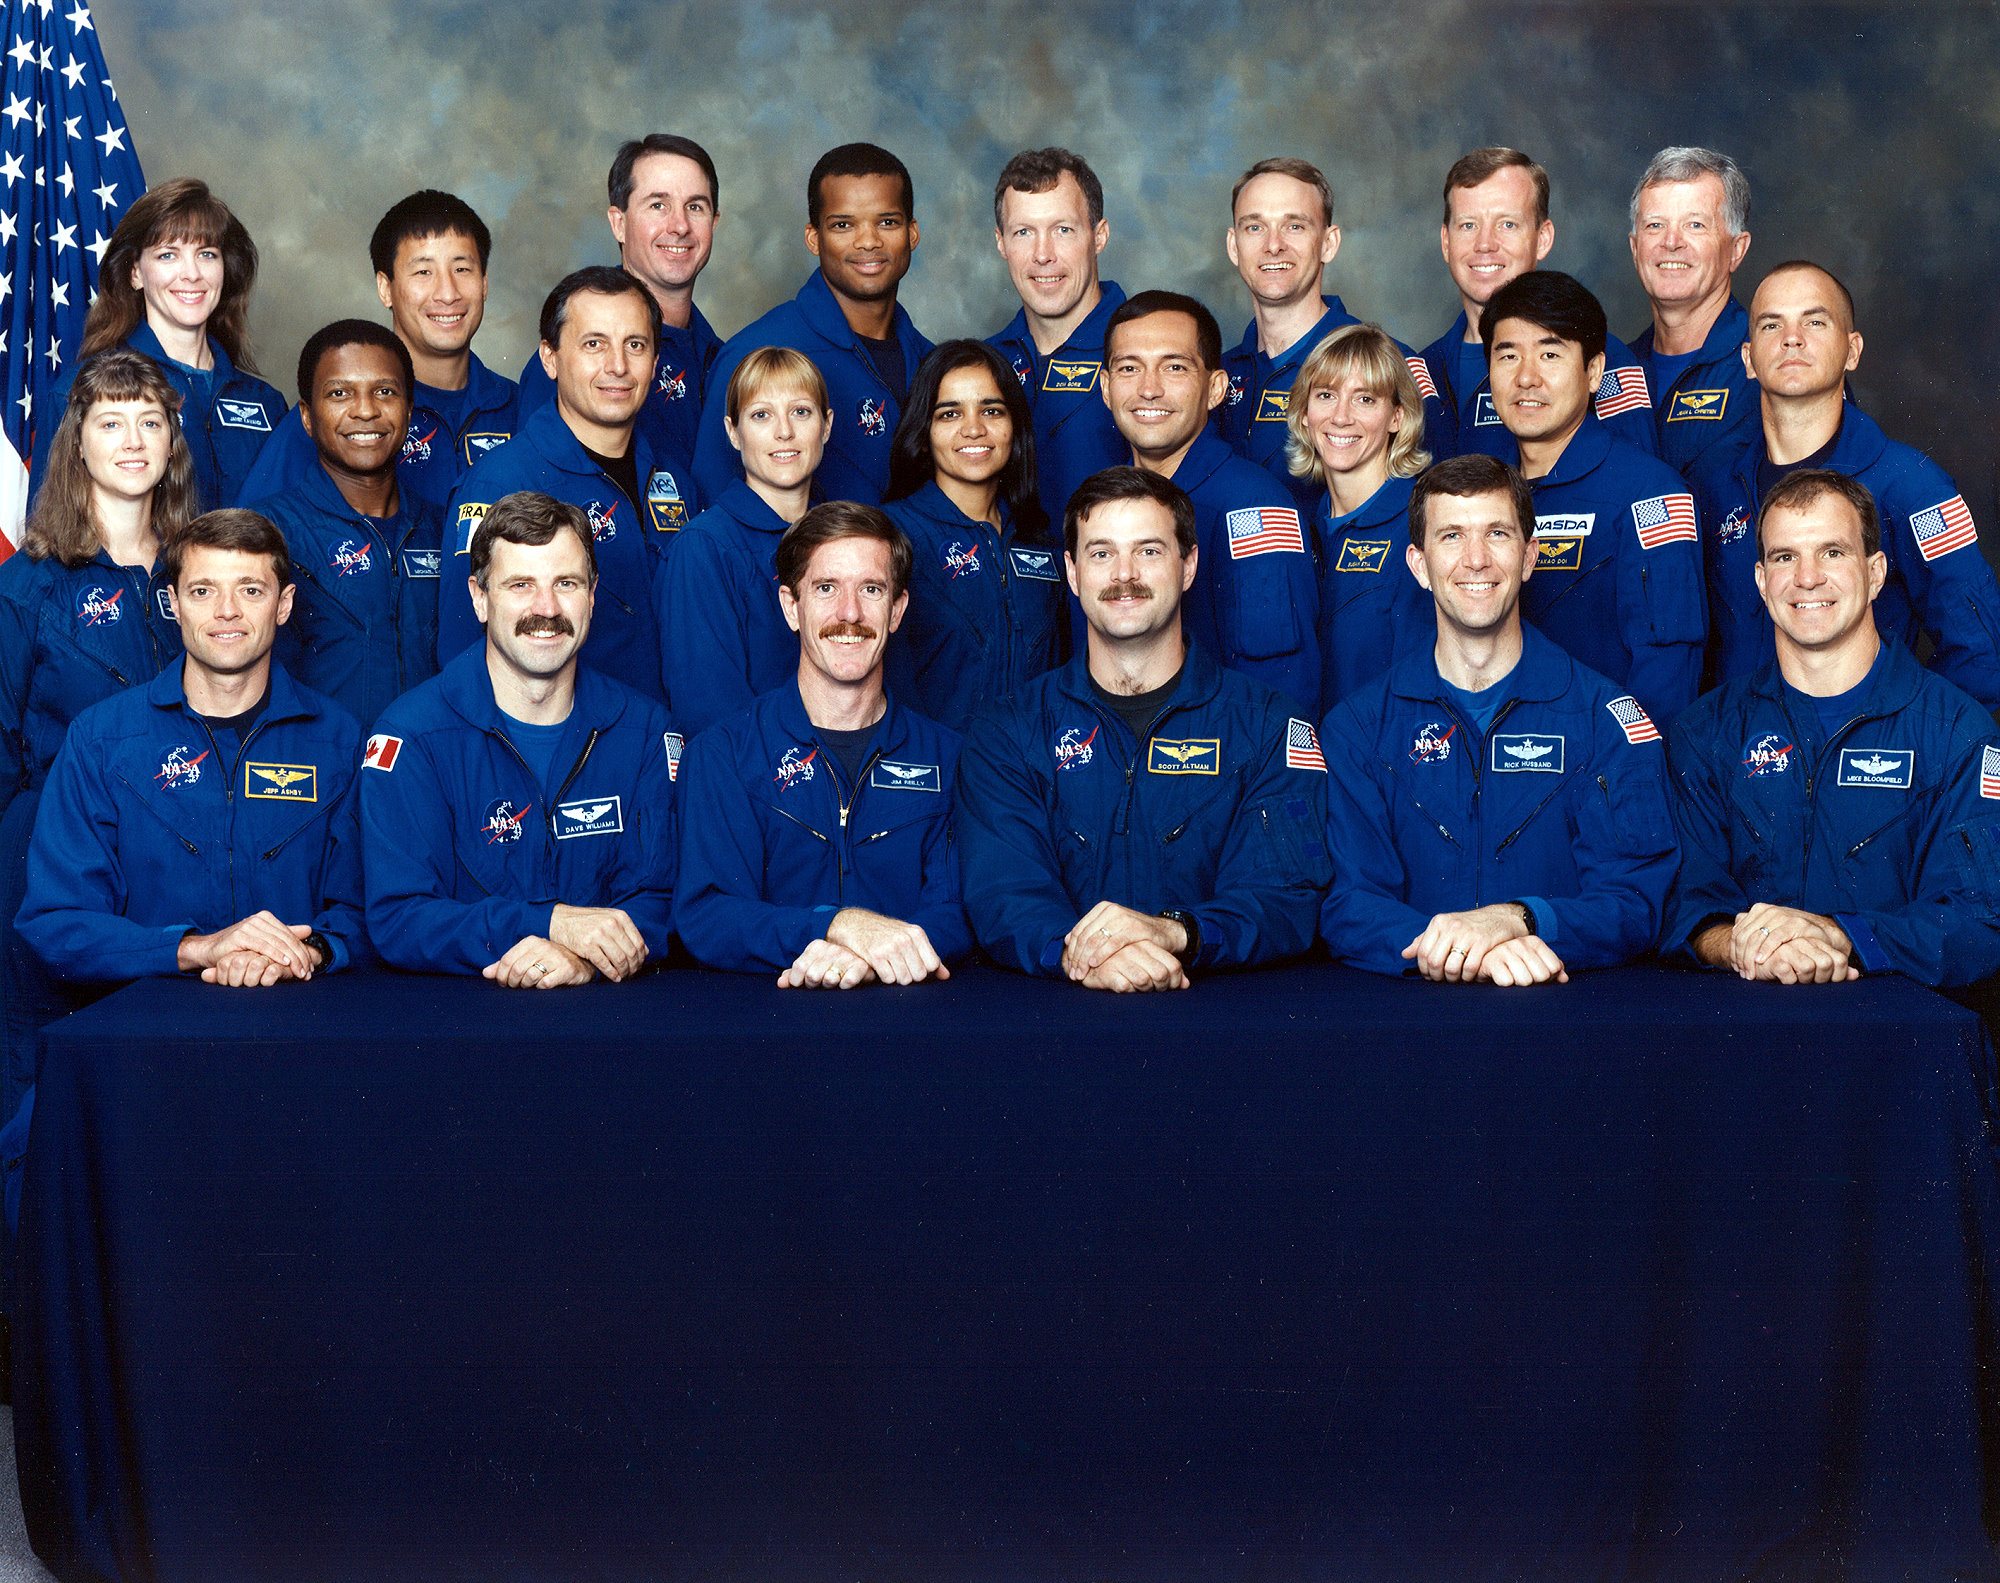 astronaut space team - photo #27